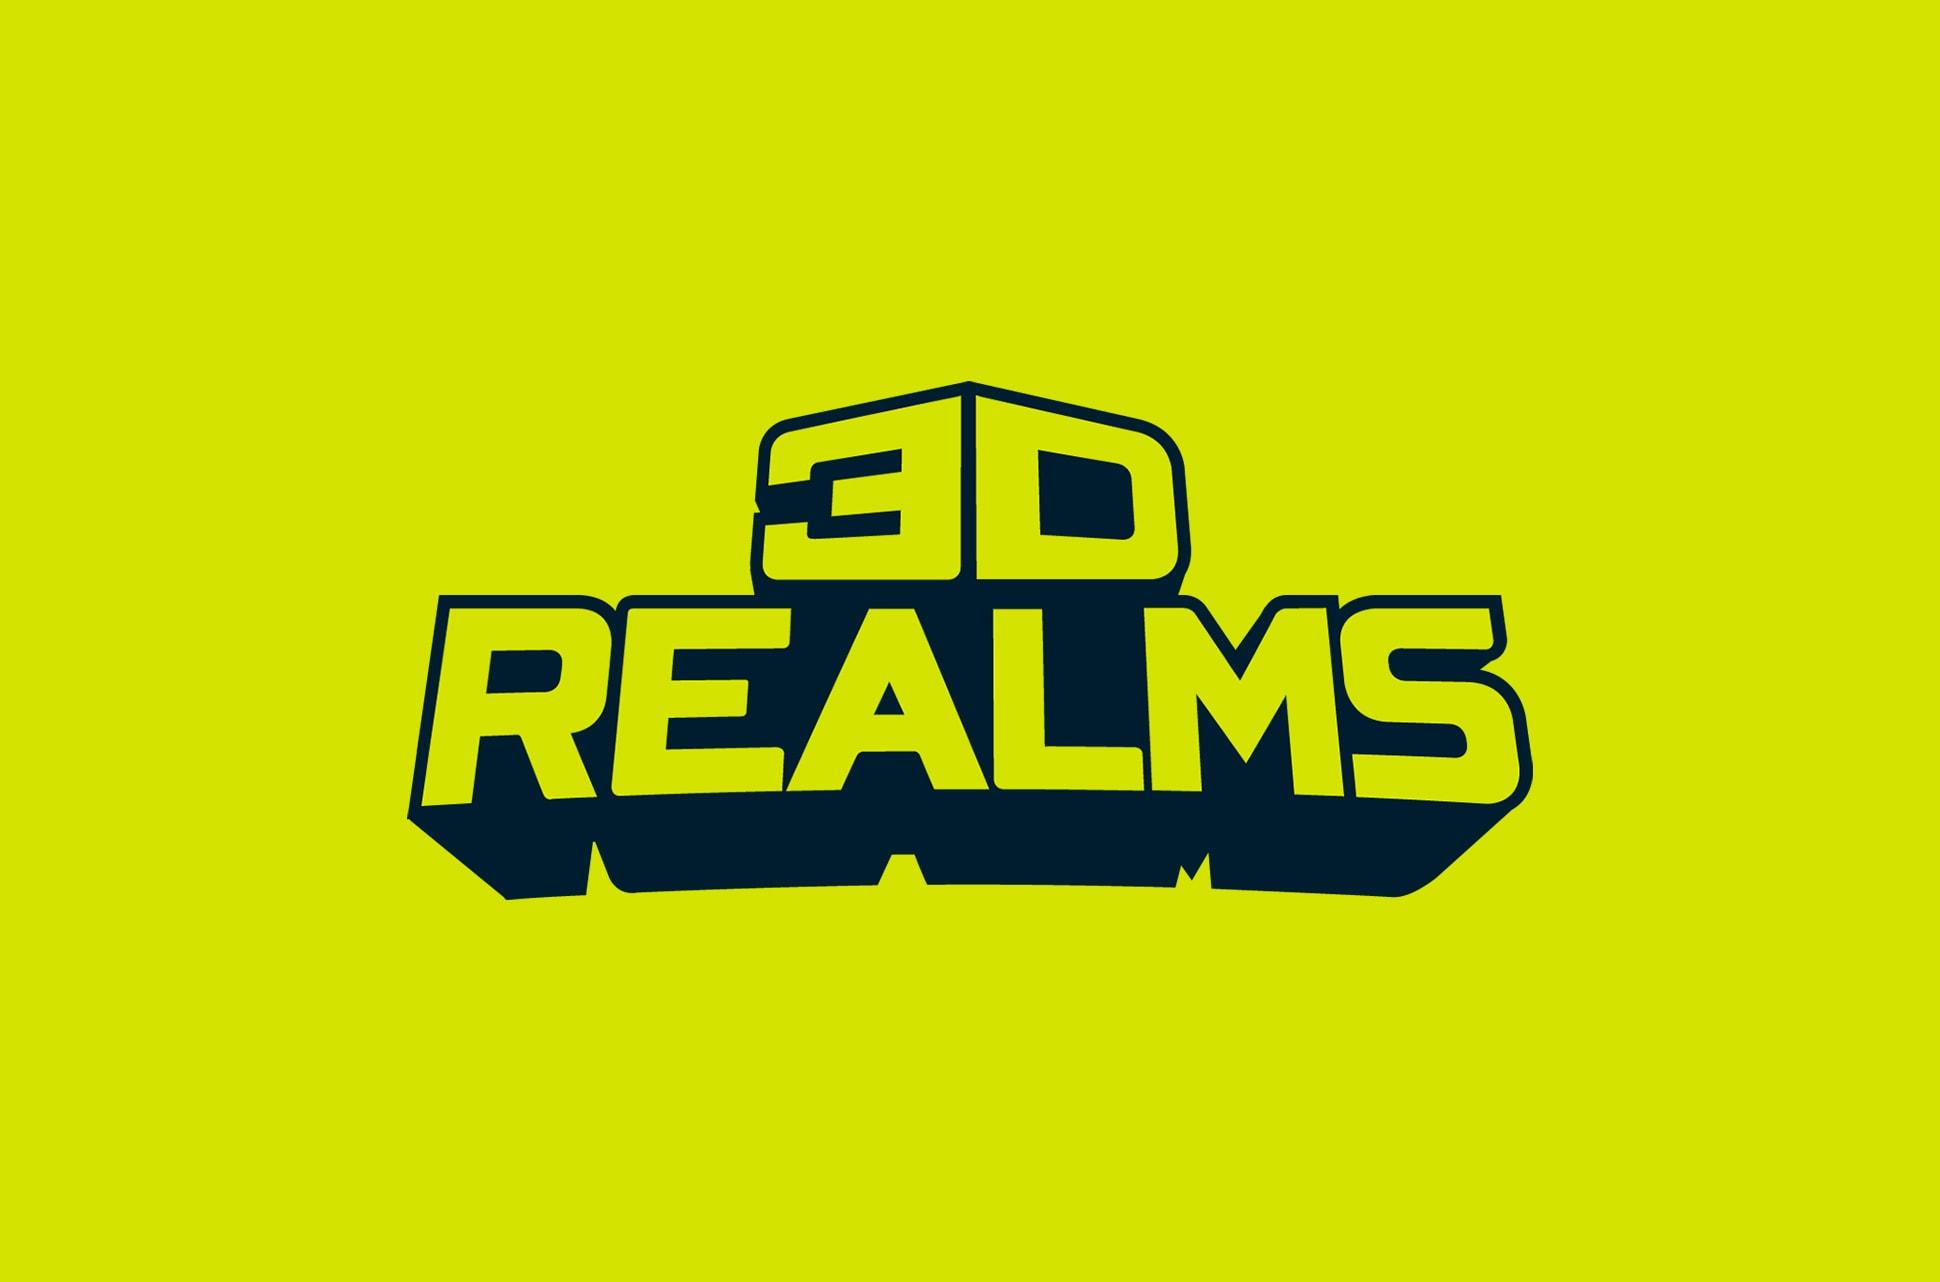 3D Realms logo.